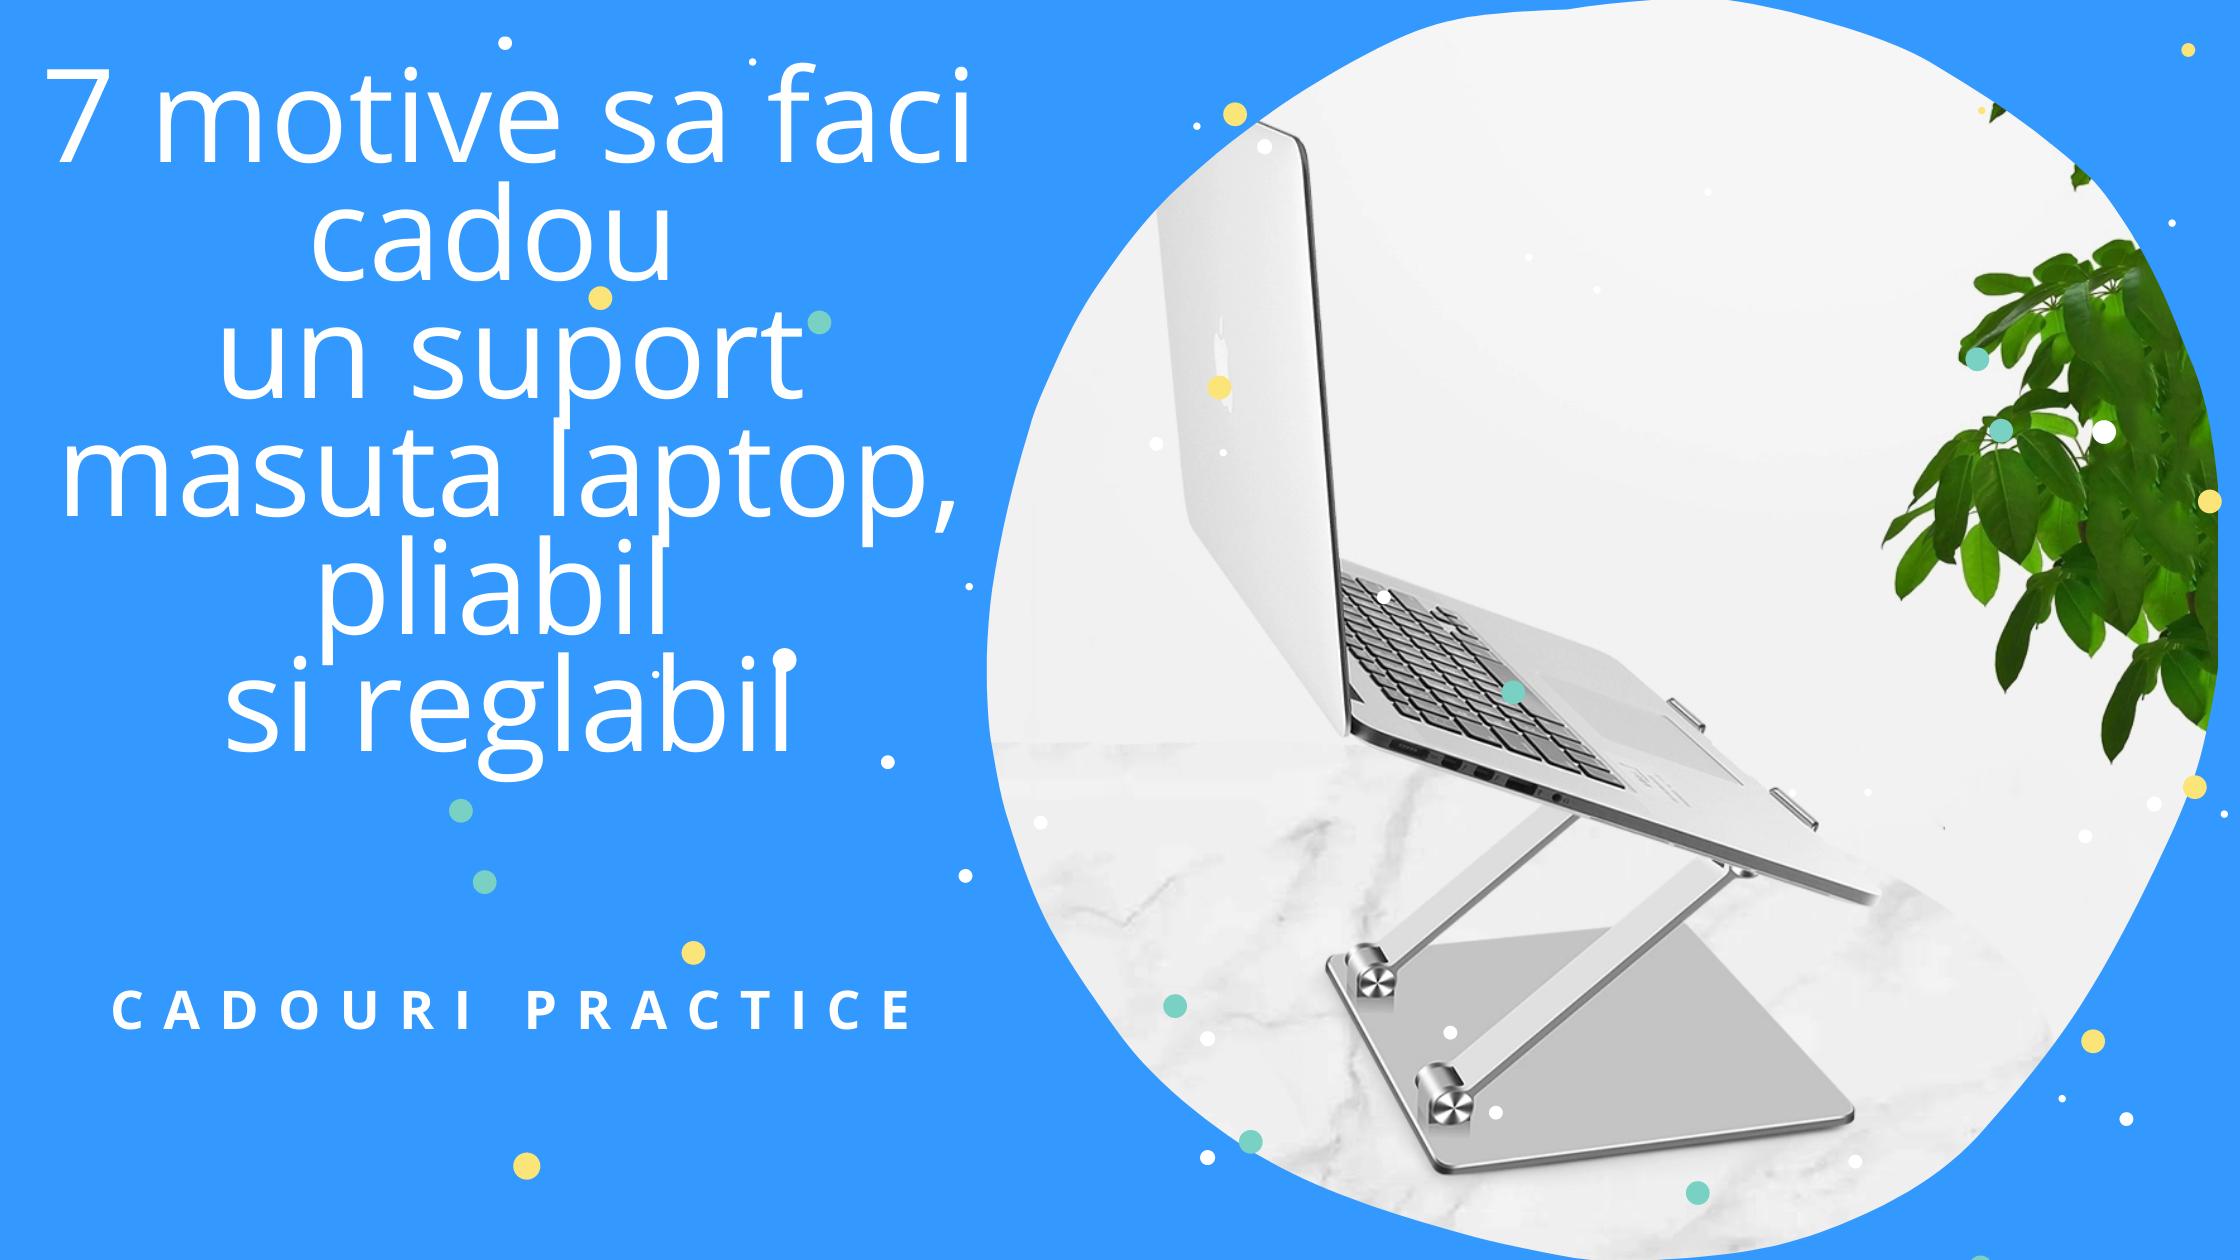 7 motive sa faci cadou un suport masuta laptop, pliabil si reglabil